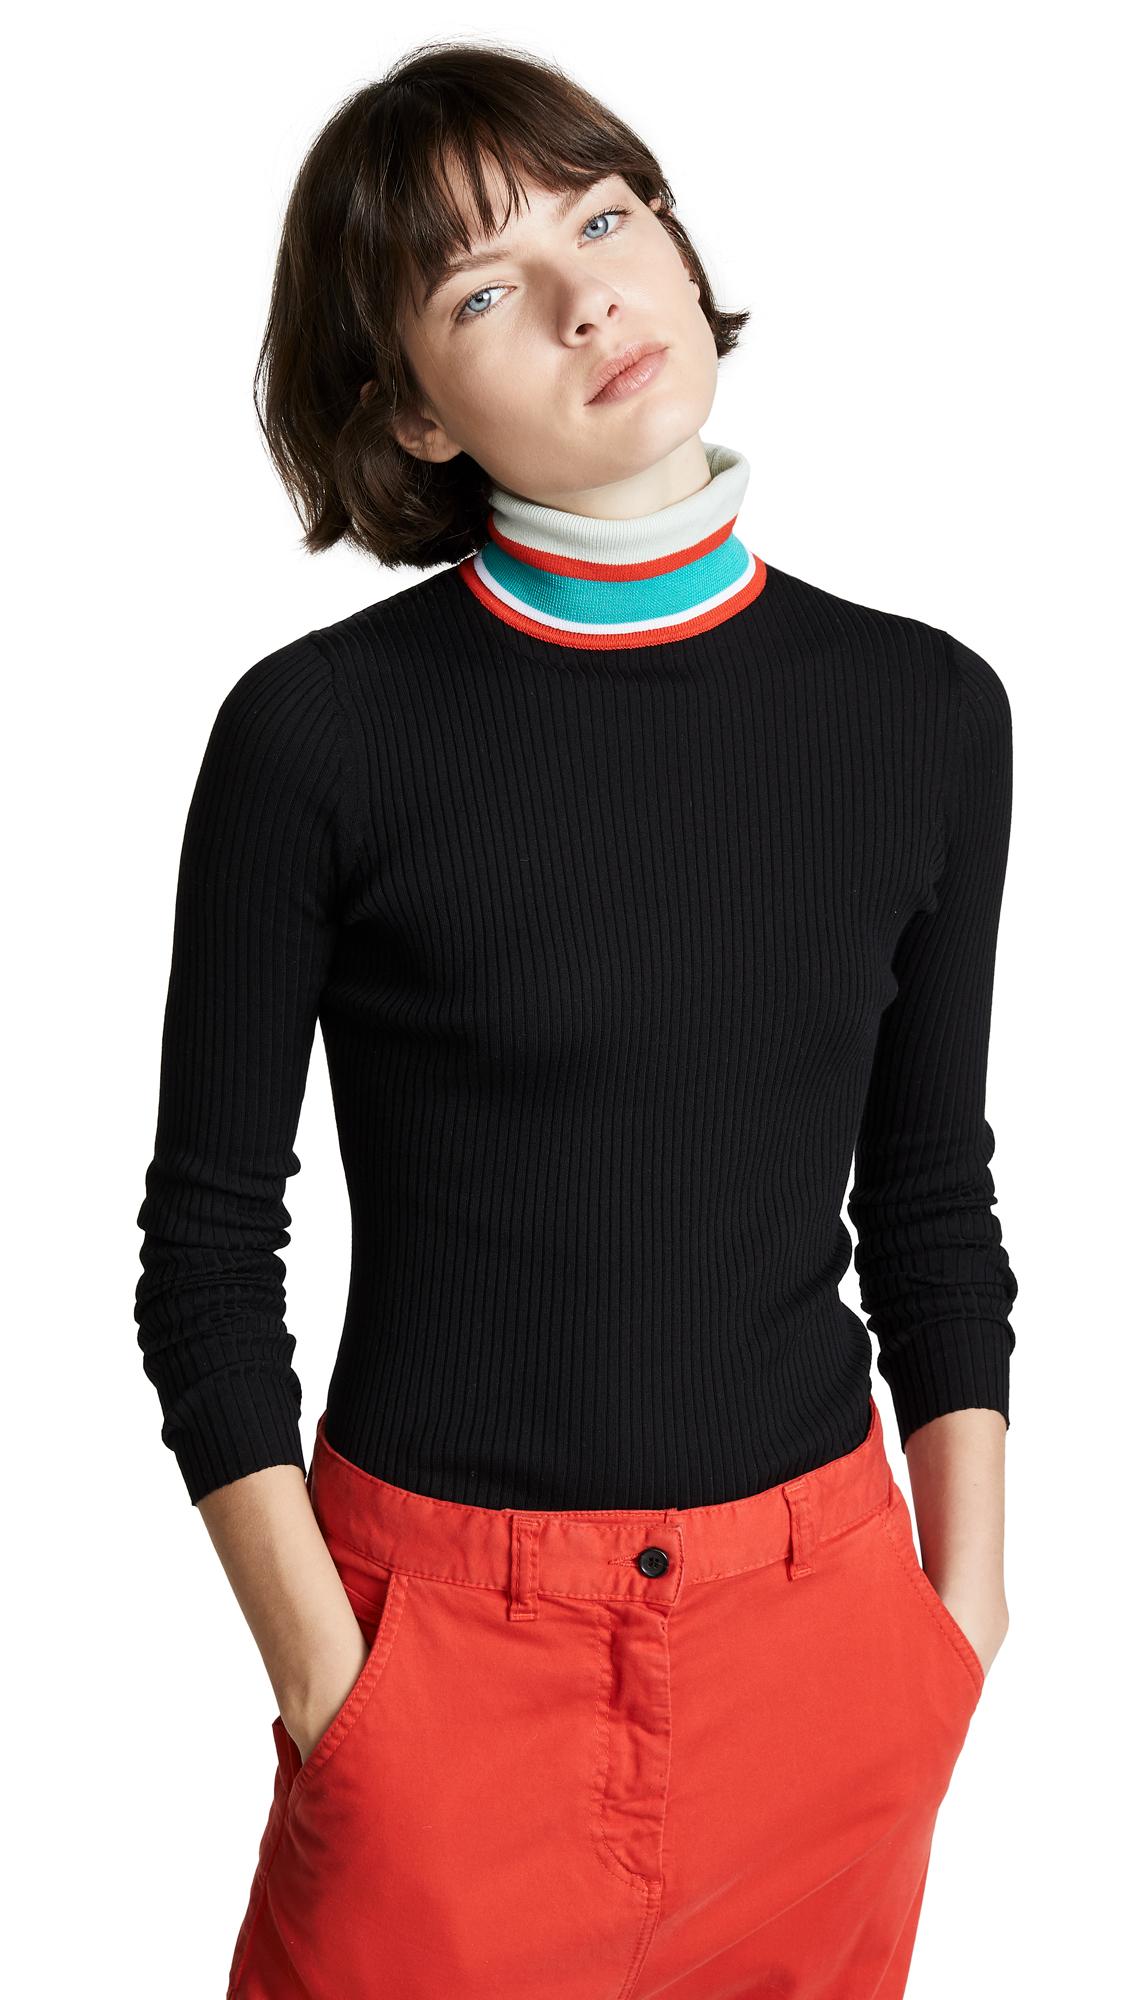 PSWL Knit Turtleneck in Black Combo